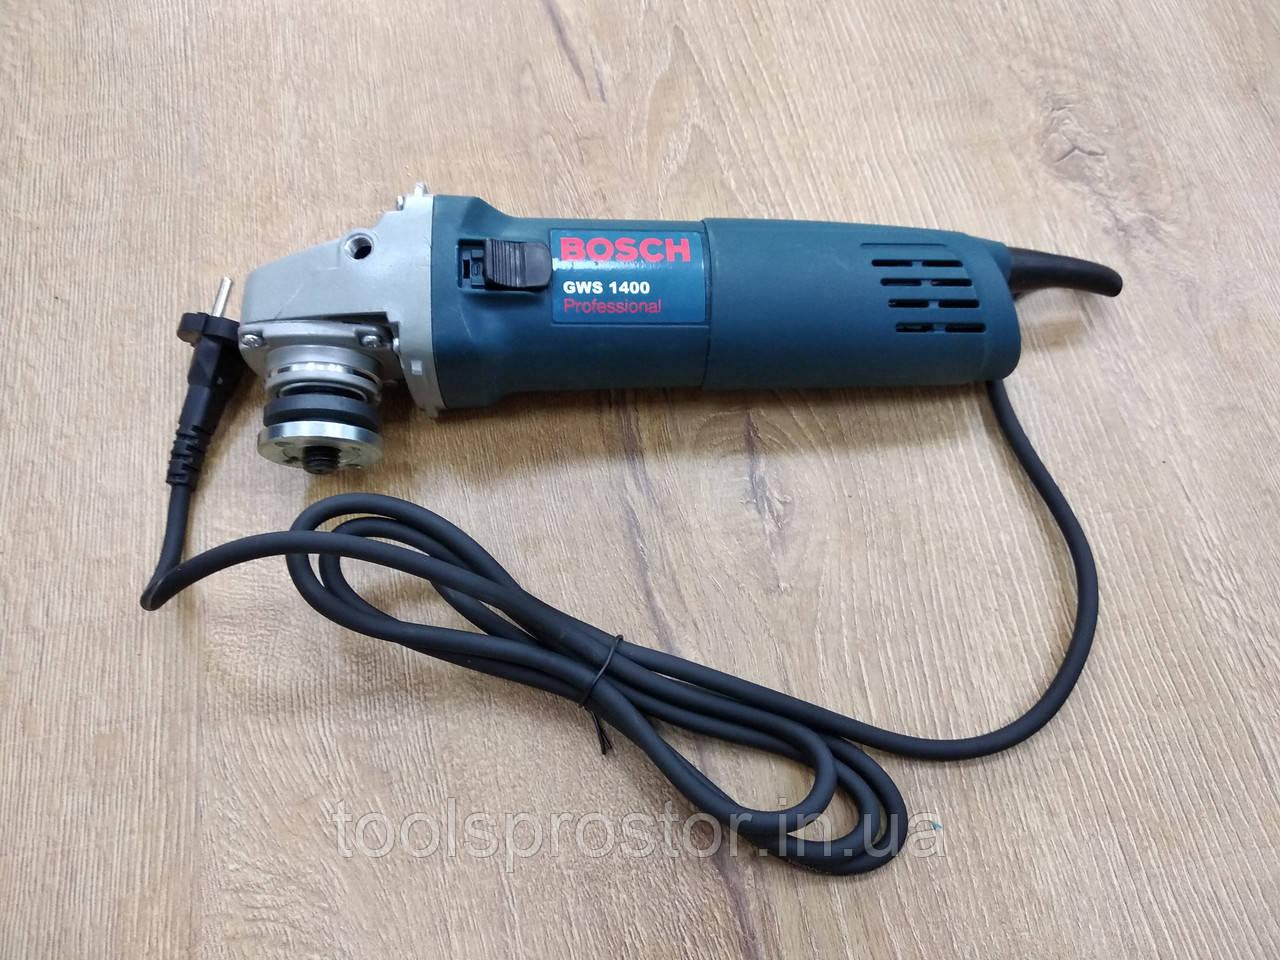 Болгарка Бош - BOSCH GWS1400 : 1.4 кВт | Гарантия 1 год